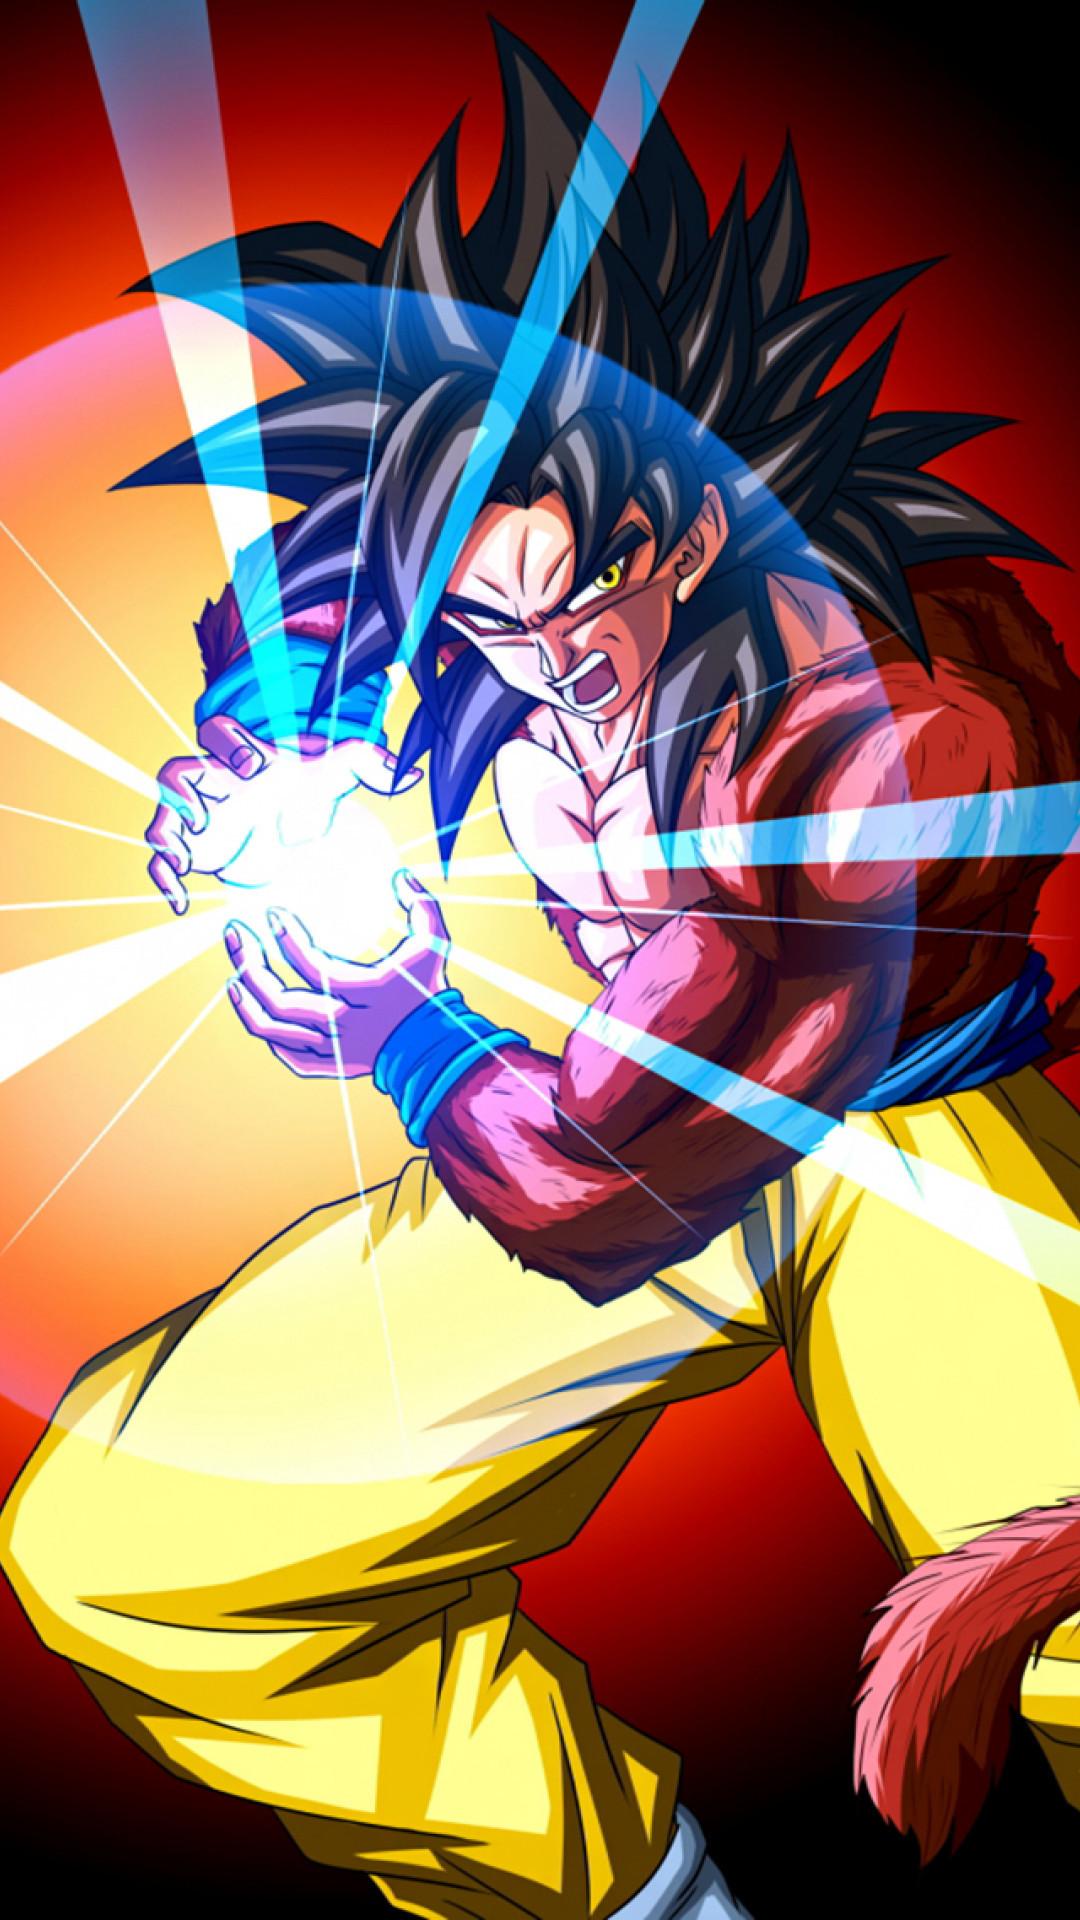 Goku super saiyan 4 wallpaper 66 images - Super saiyan 6 goku pictures ...